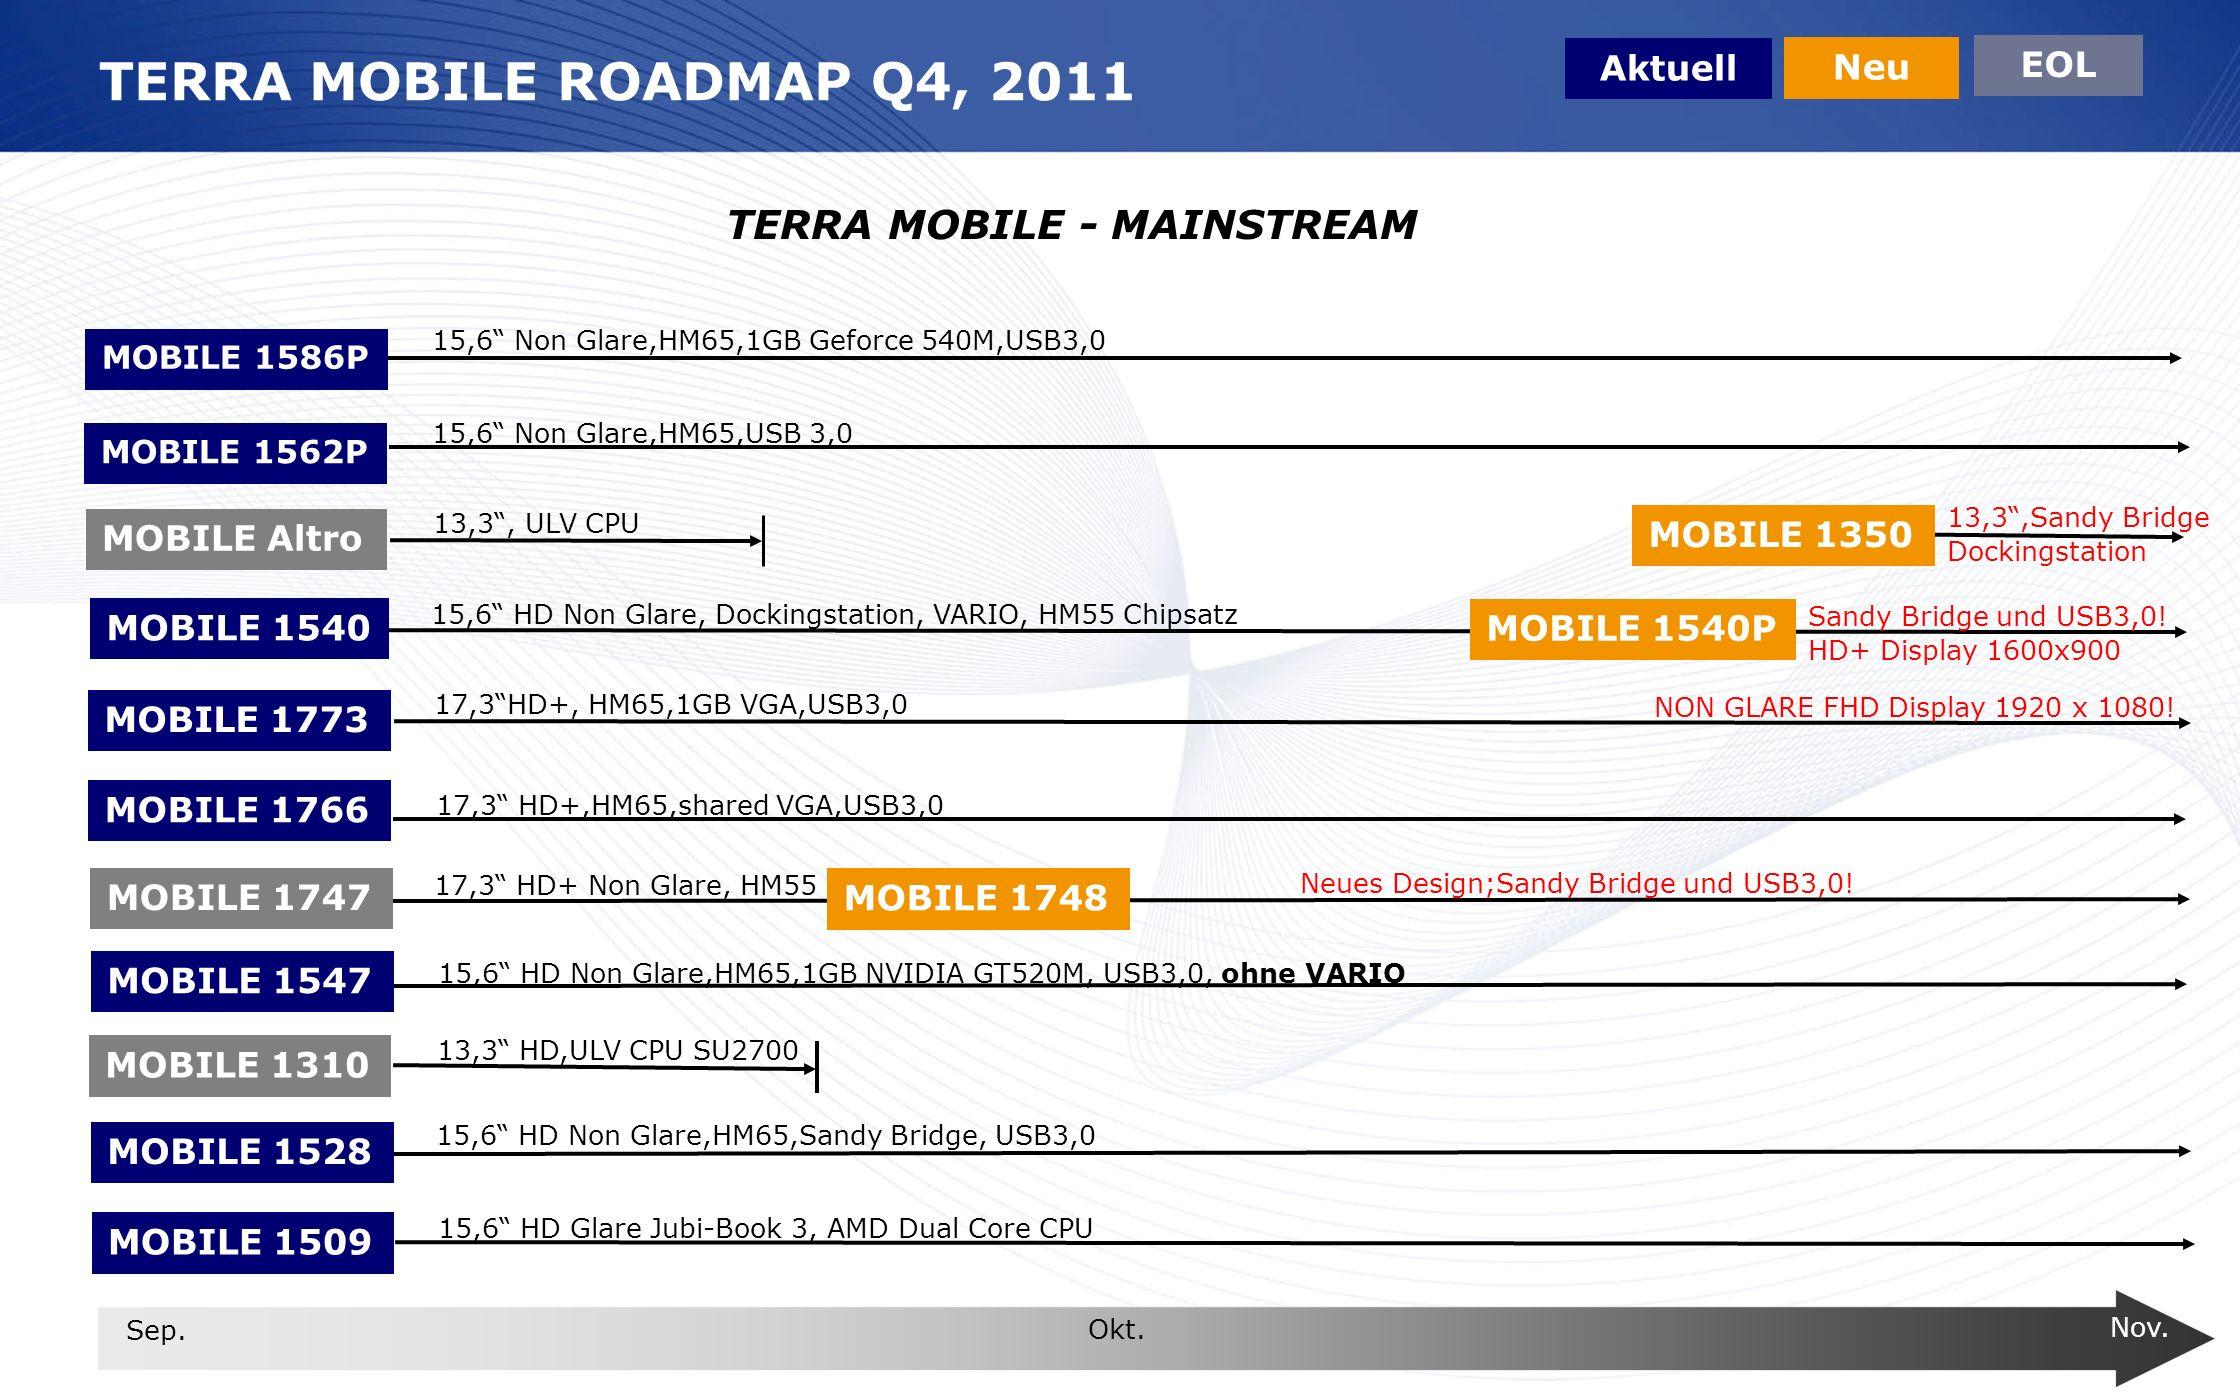 www.wortmann.de TERRA MOBILE ROADMAP Q4, 2011 MOBILE Altro MOBILE 1310 Aktuell Neu EOL 13,3, ULV CPU 13,3 HD,ULV CPU SU2700 MOBILE 1540 MOBILE 1766 MO